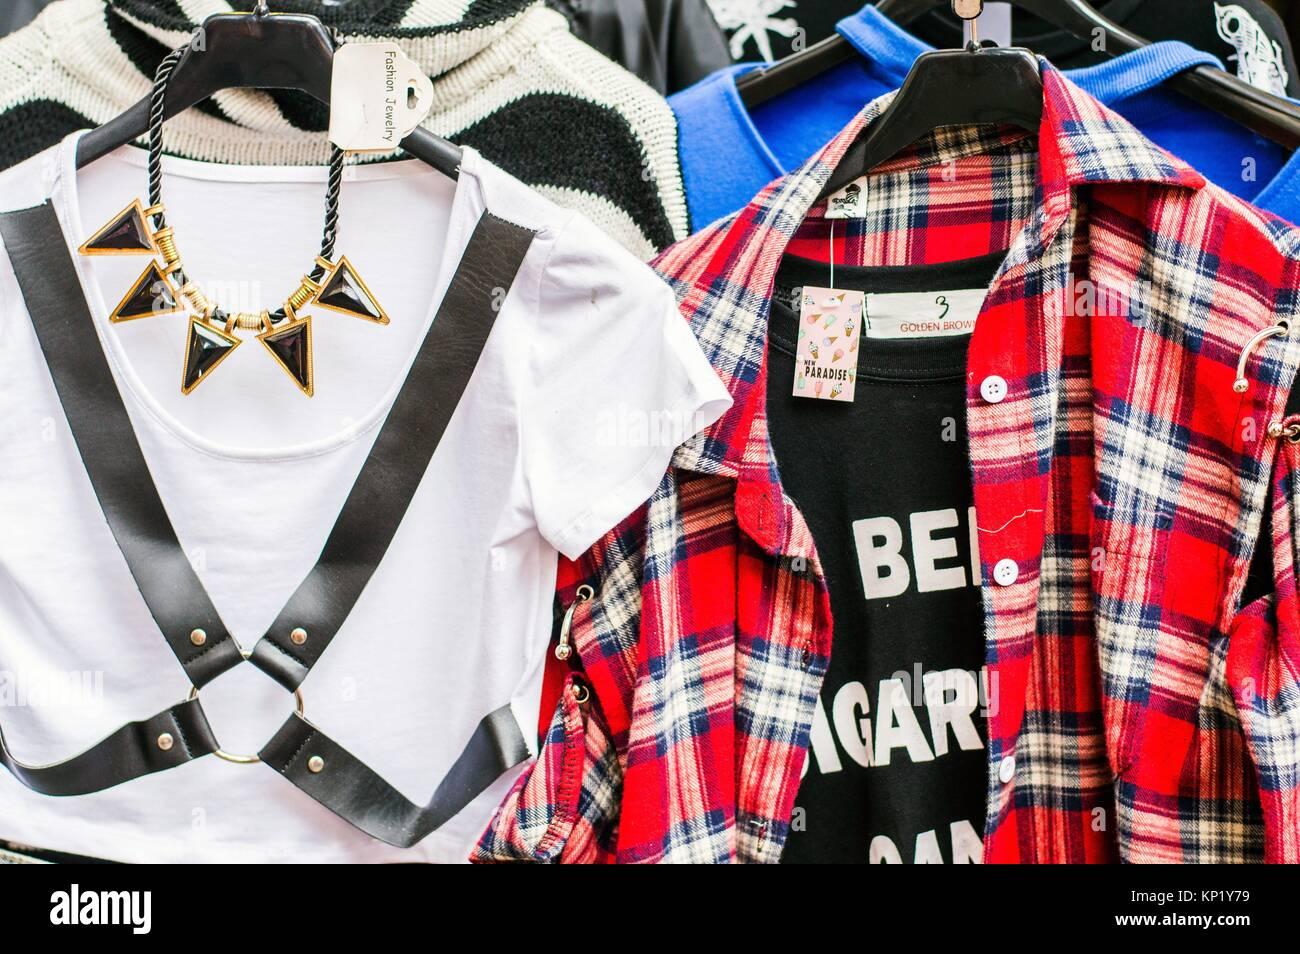 Women´s fashion items on display outside boutique, Ximending, Taipei, Taiwan - Stock Image